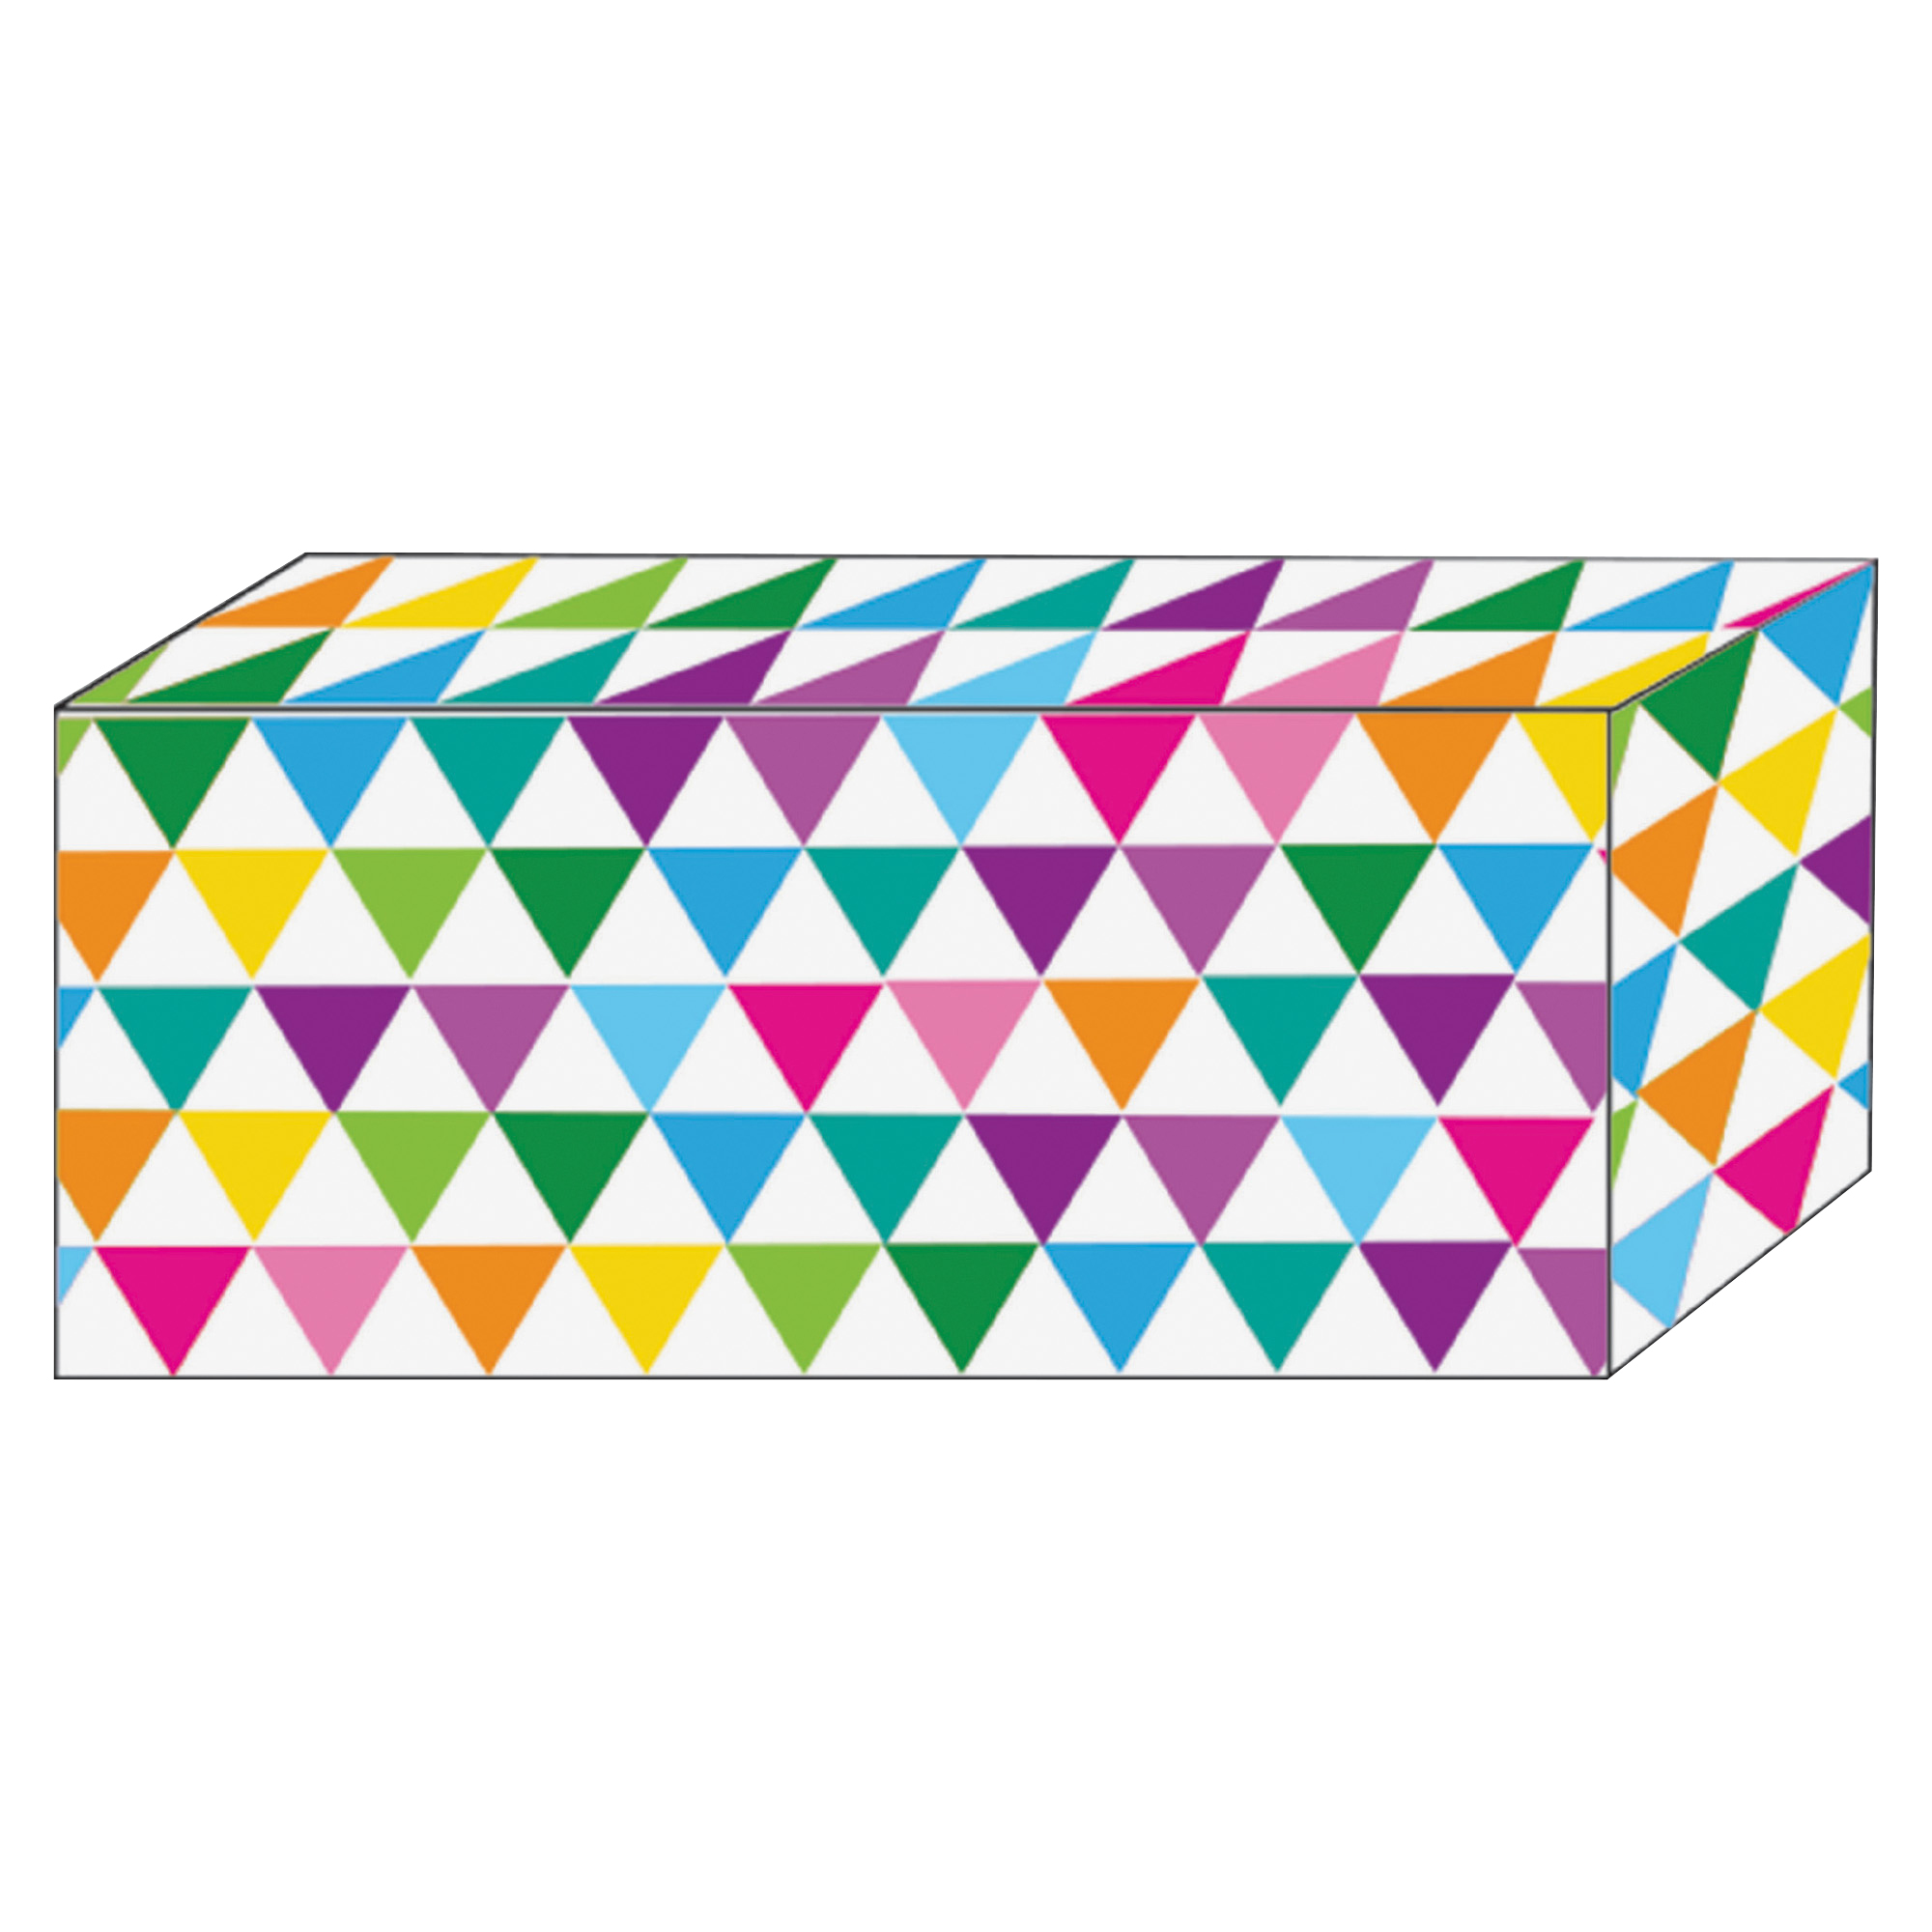 Ashley Color Triangle Design Magnetic Blocks - Heavy Duty - 5 / Pack - Multicolor